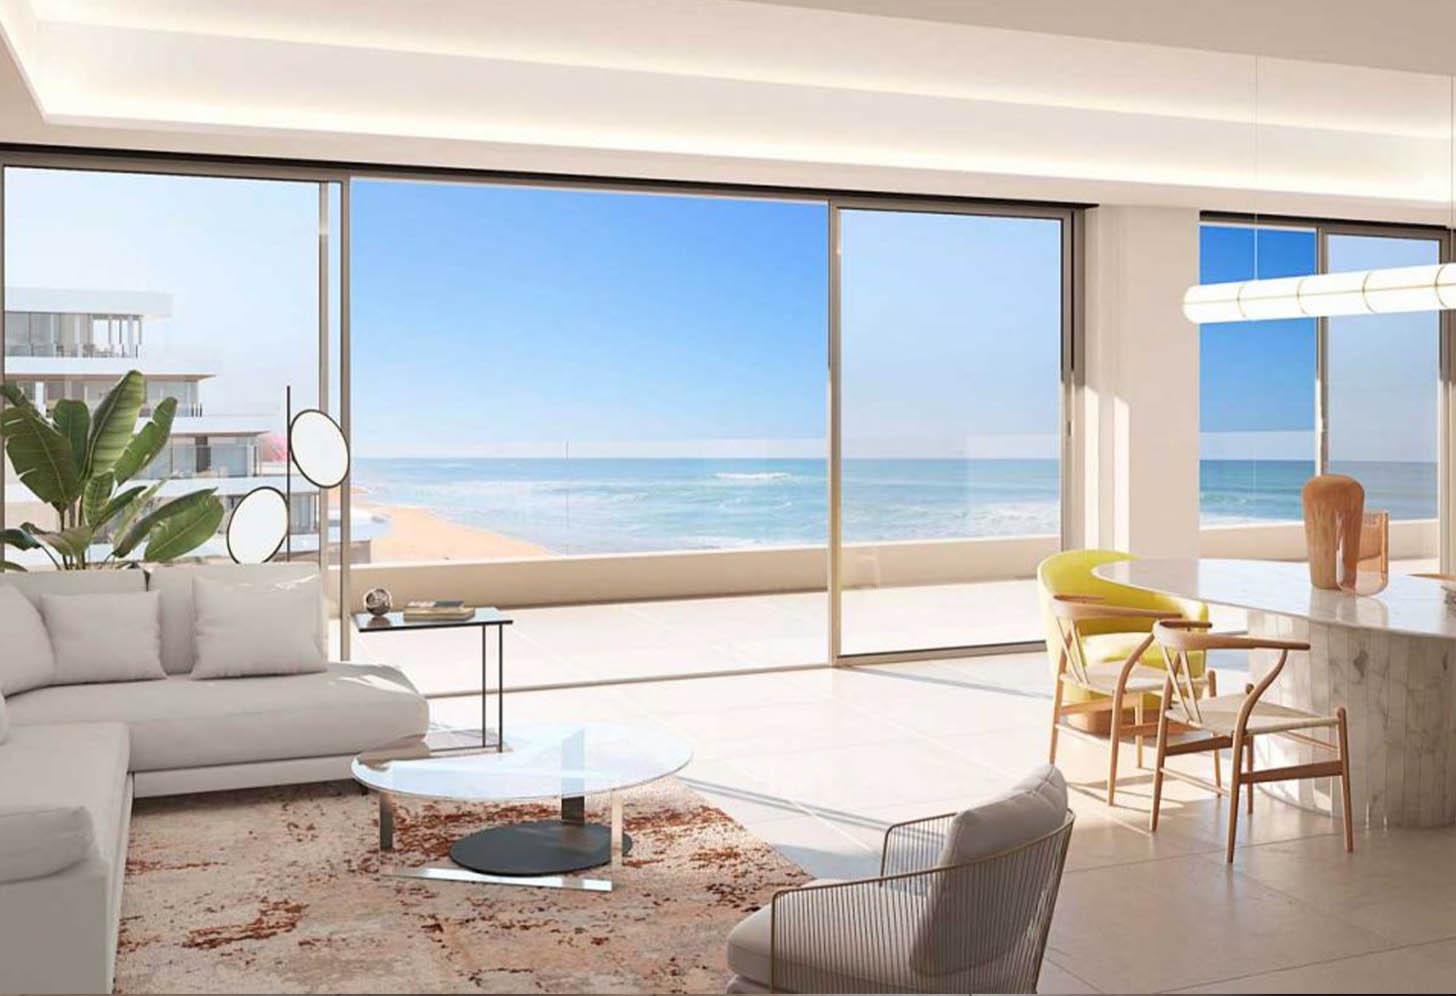 immobilier neuf espagne costa del sol on-e14 nereidas residential salon 2